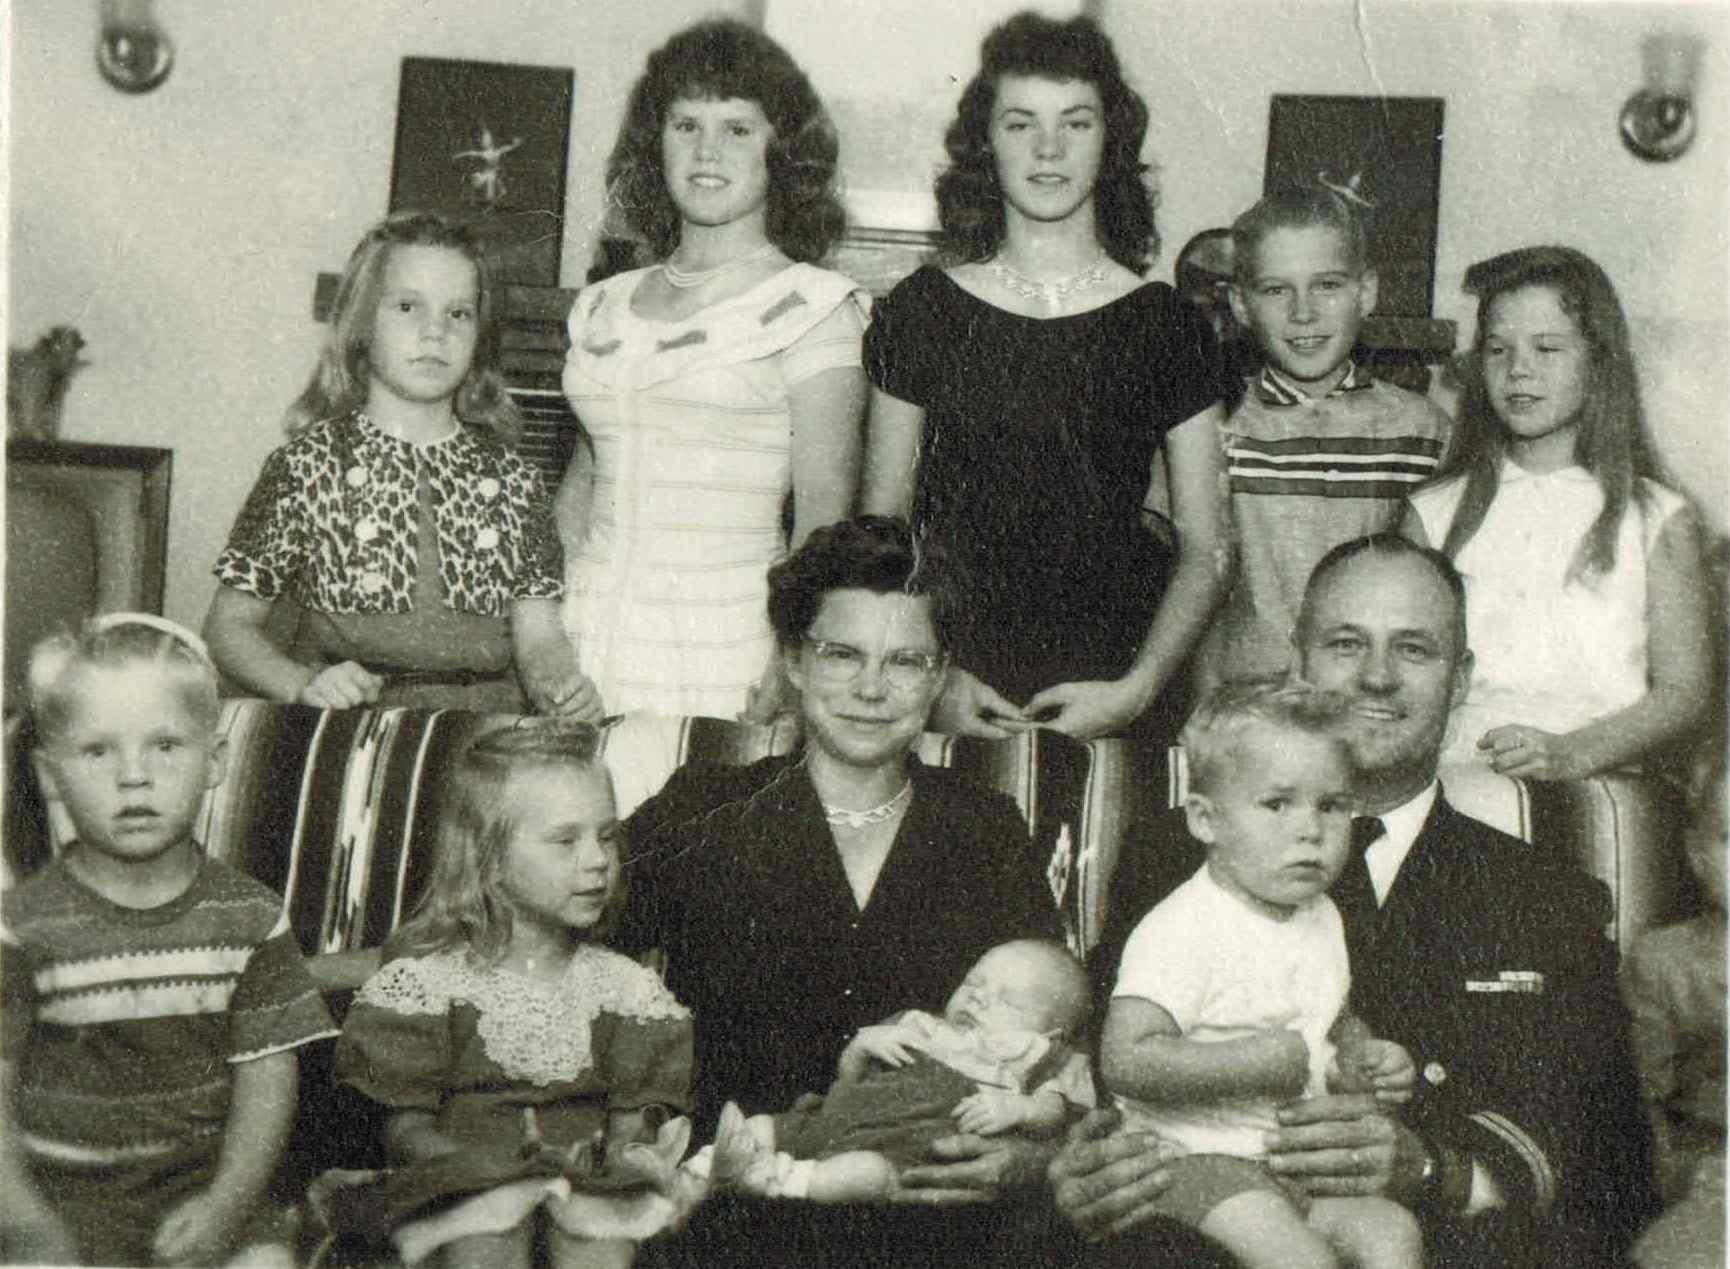 Linzey 1958 El Cajon, CA